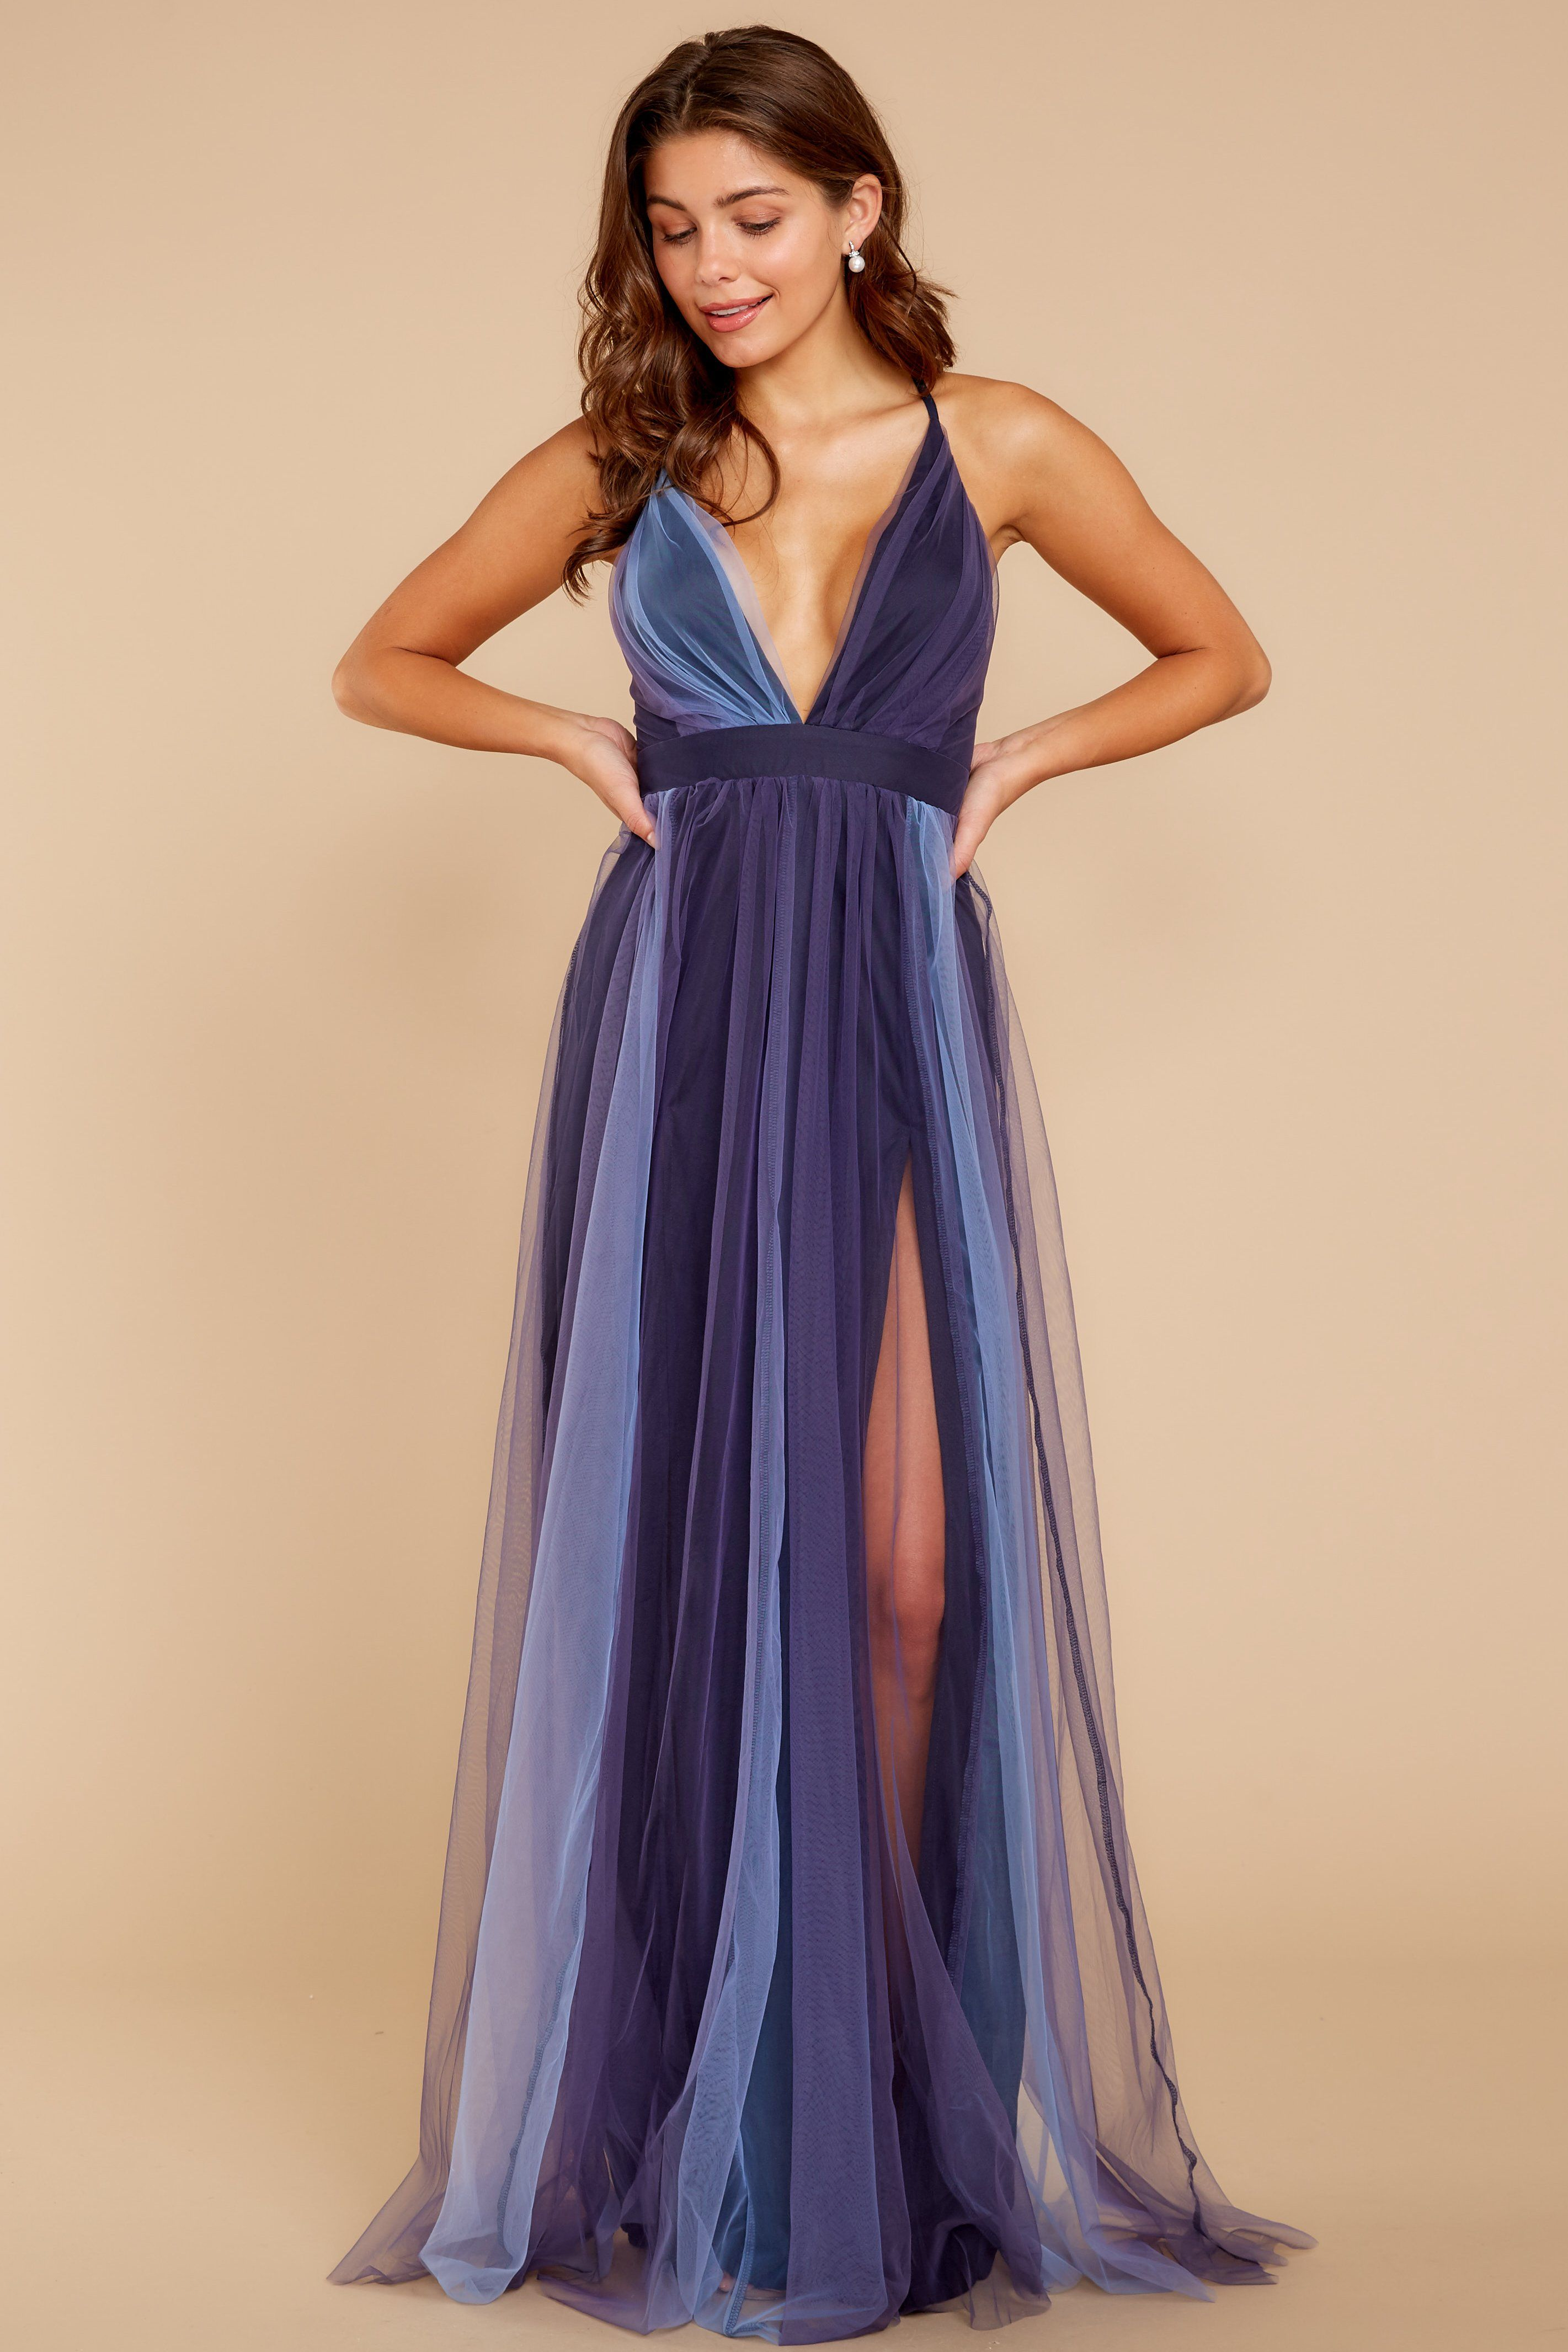 c30b2c53be4 Elegant Purple Multi Maxi Dress - Formal Maxi Dress - Maxi Dress -  72 –  Red Dress Boutique